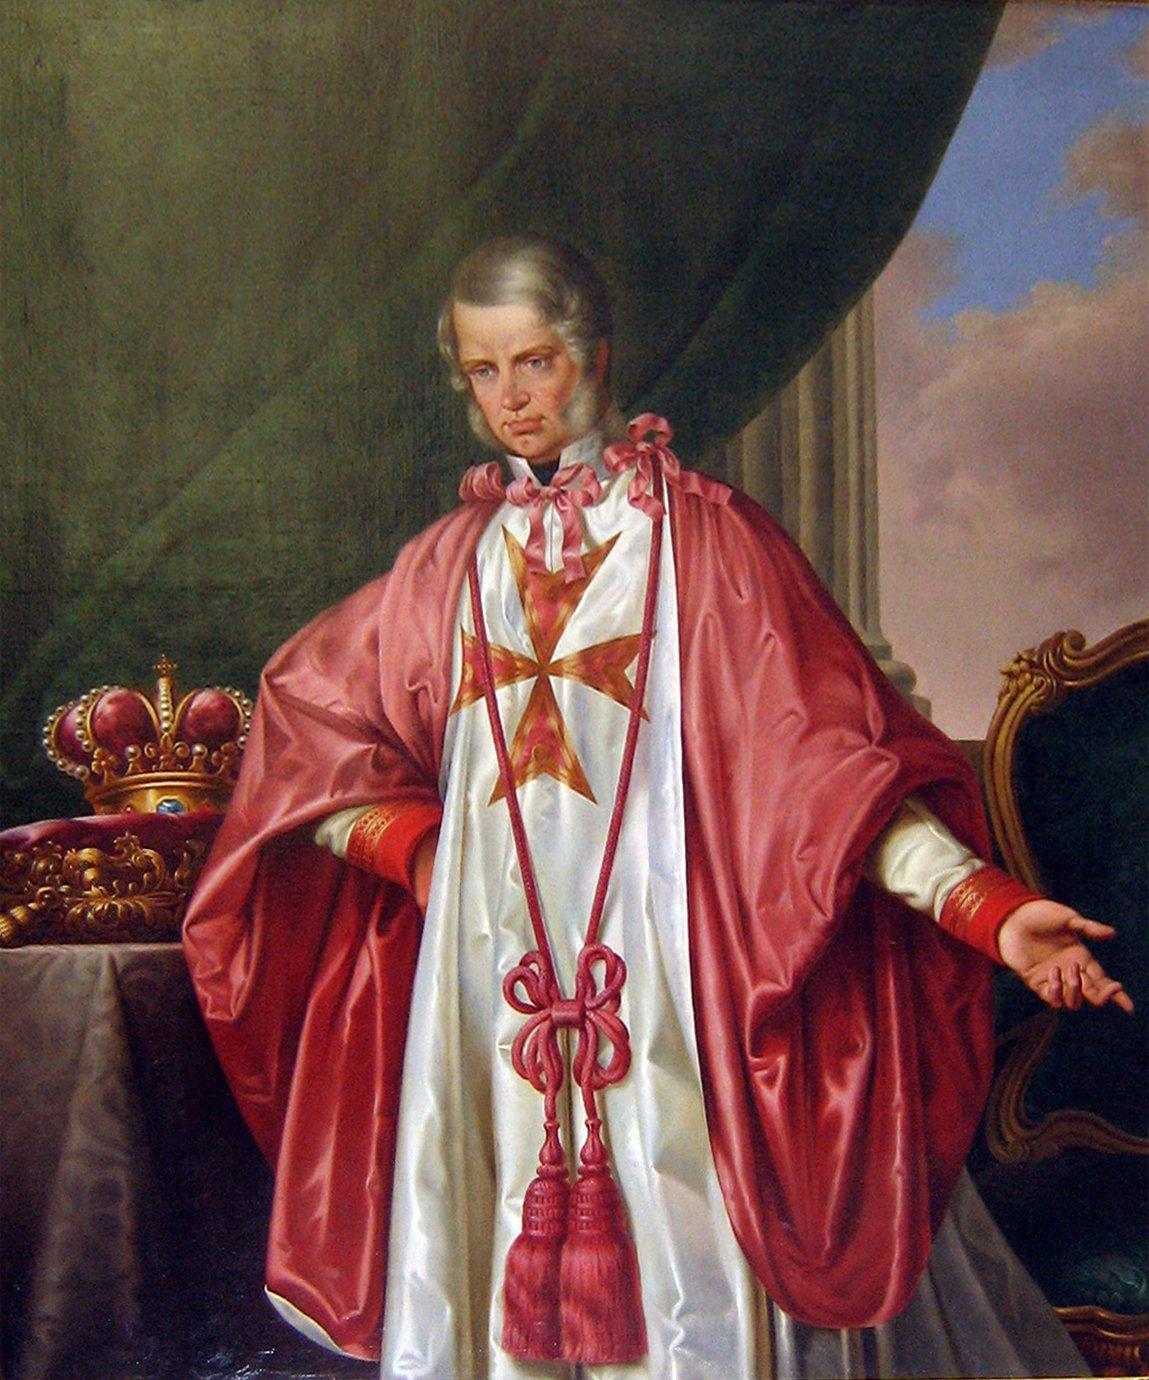 Giuseppe Bezzuoli Grand Duca Leopoldo II di Toscana